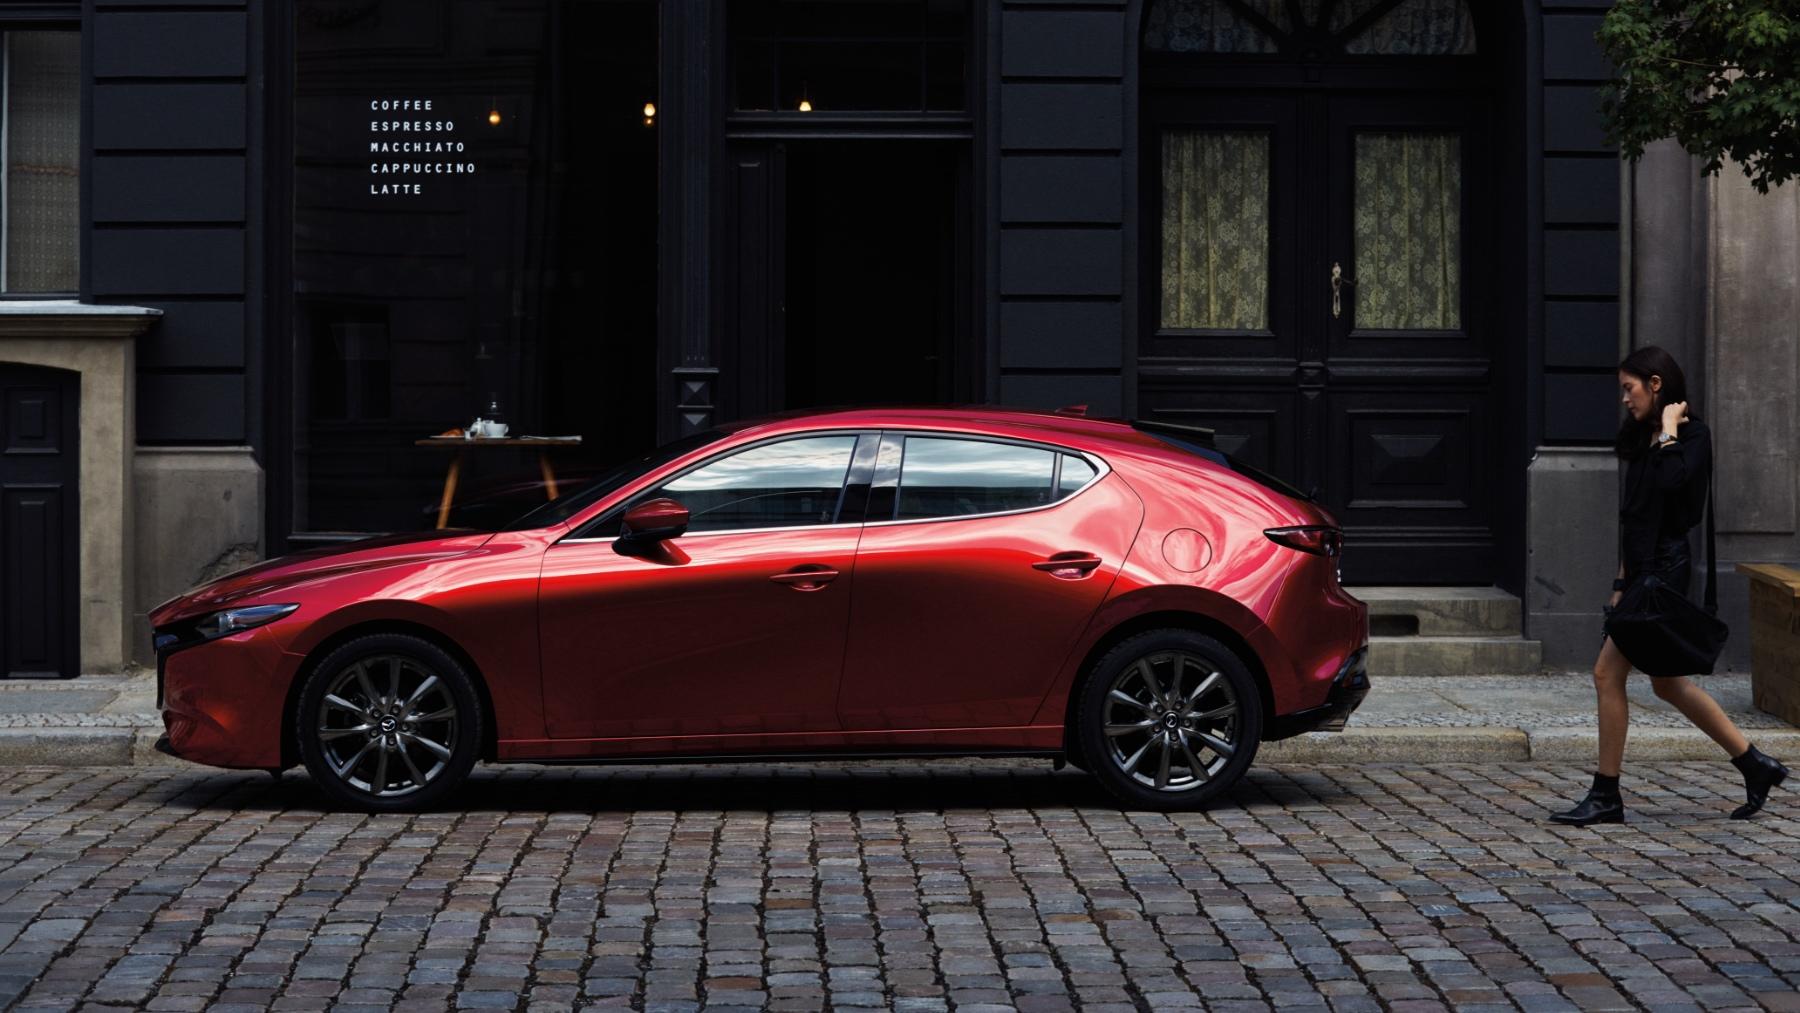 2021 mazda 3 hatchback - premium awd compact car | mazda usa